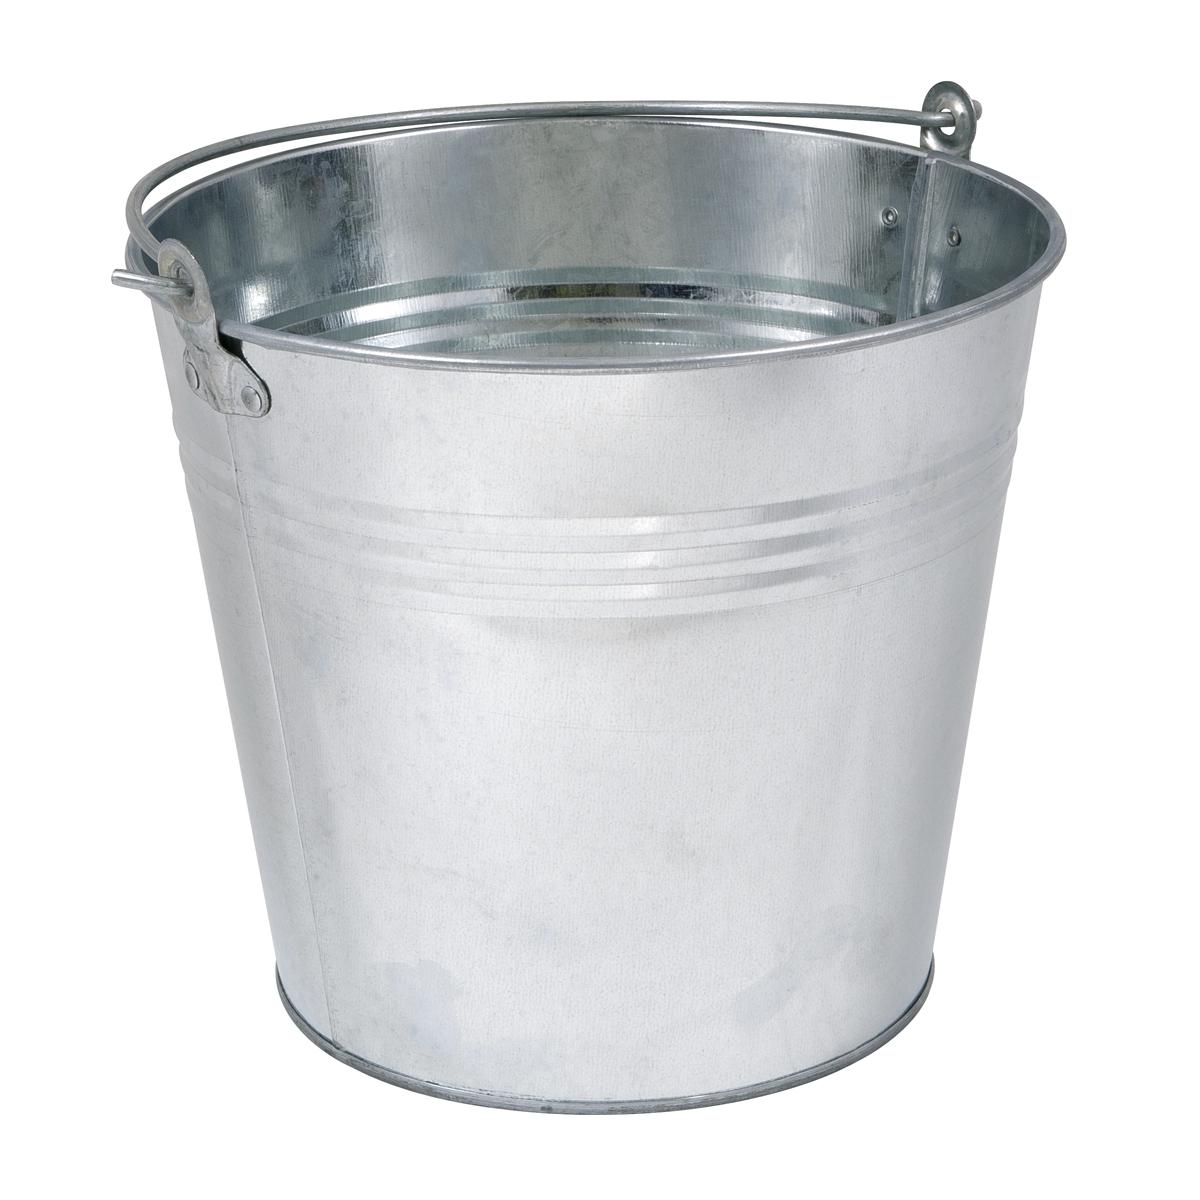 Bucket 12L - Galvanized